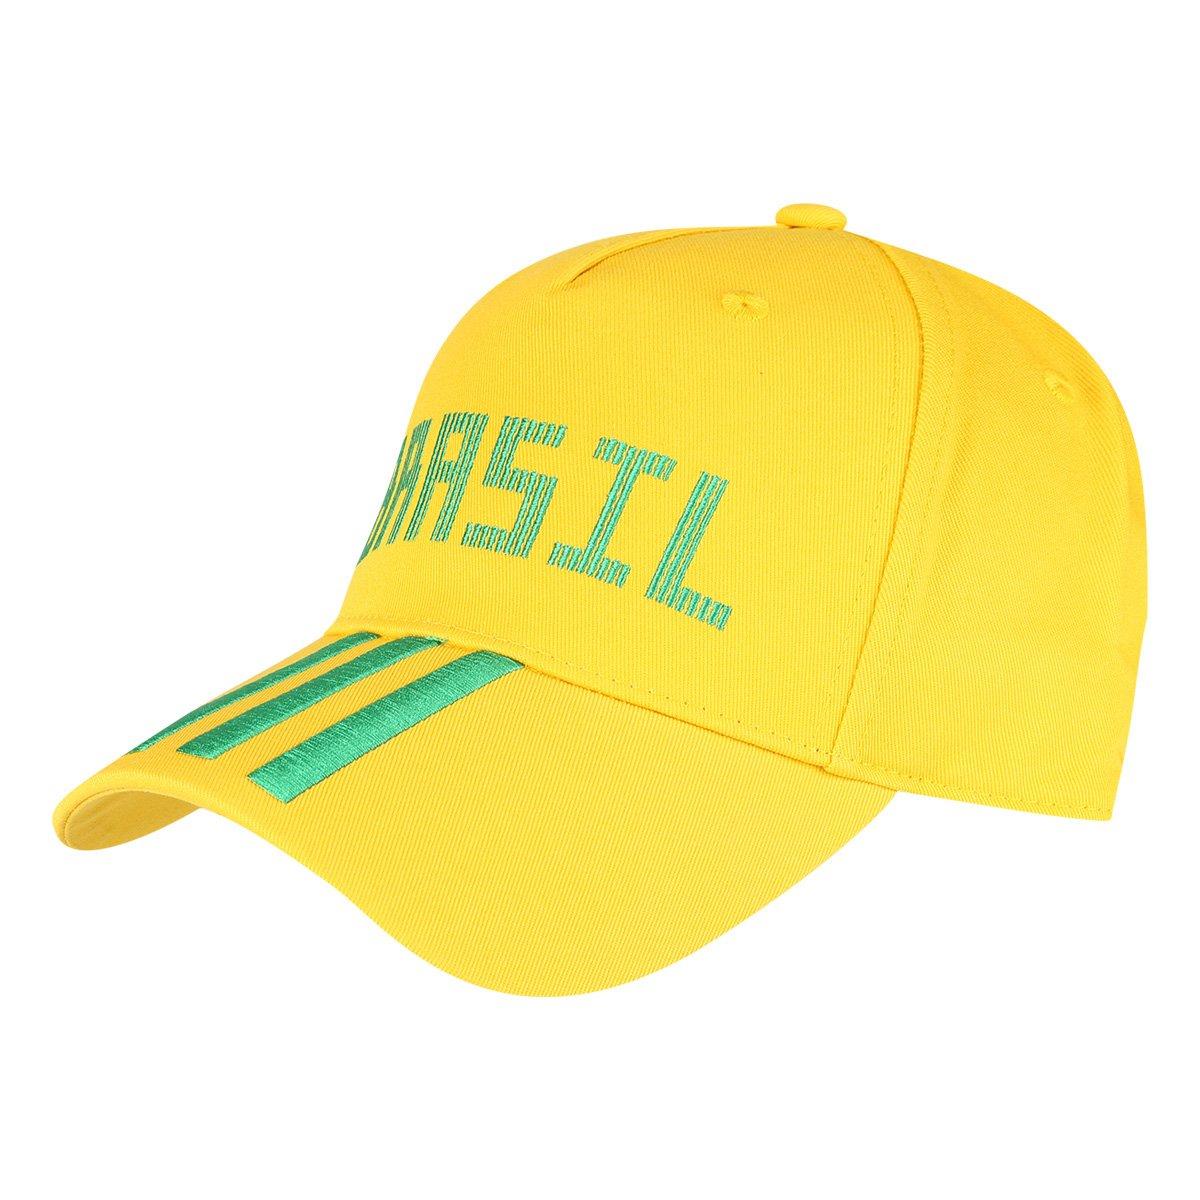 4e8c68269aa21 Boné Adidas Brasil Aba Curva 3 Stripes | Allianz Parque Shop